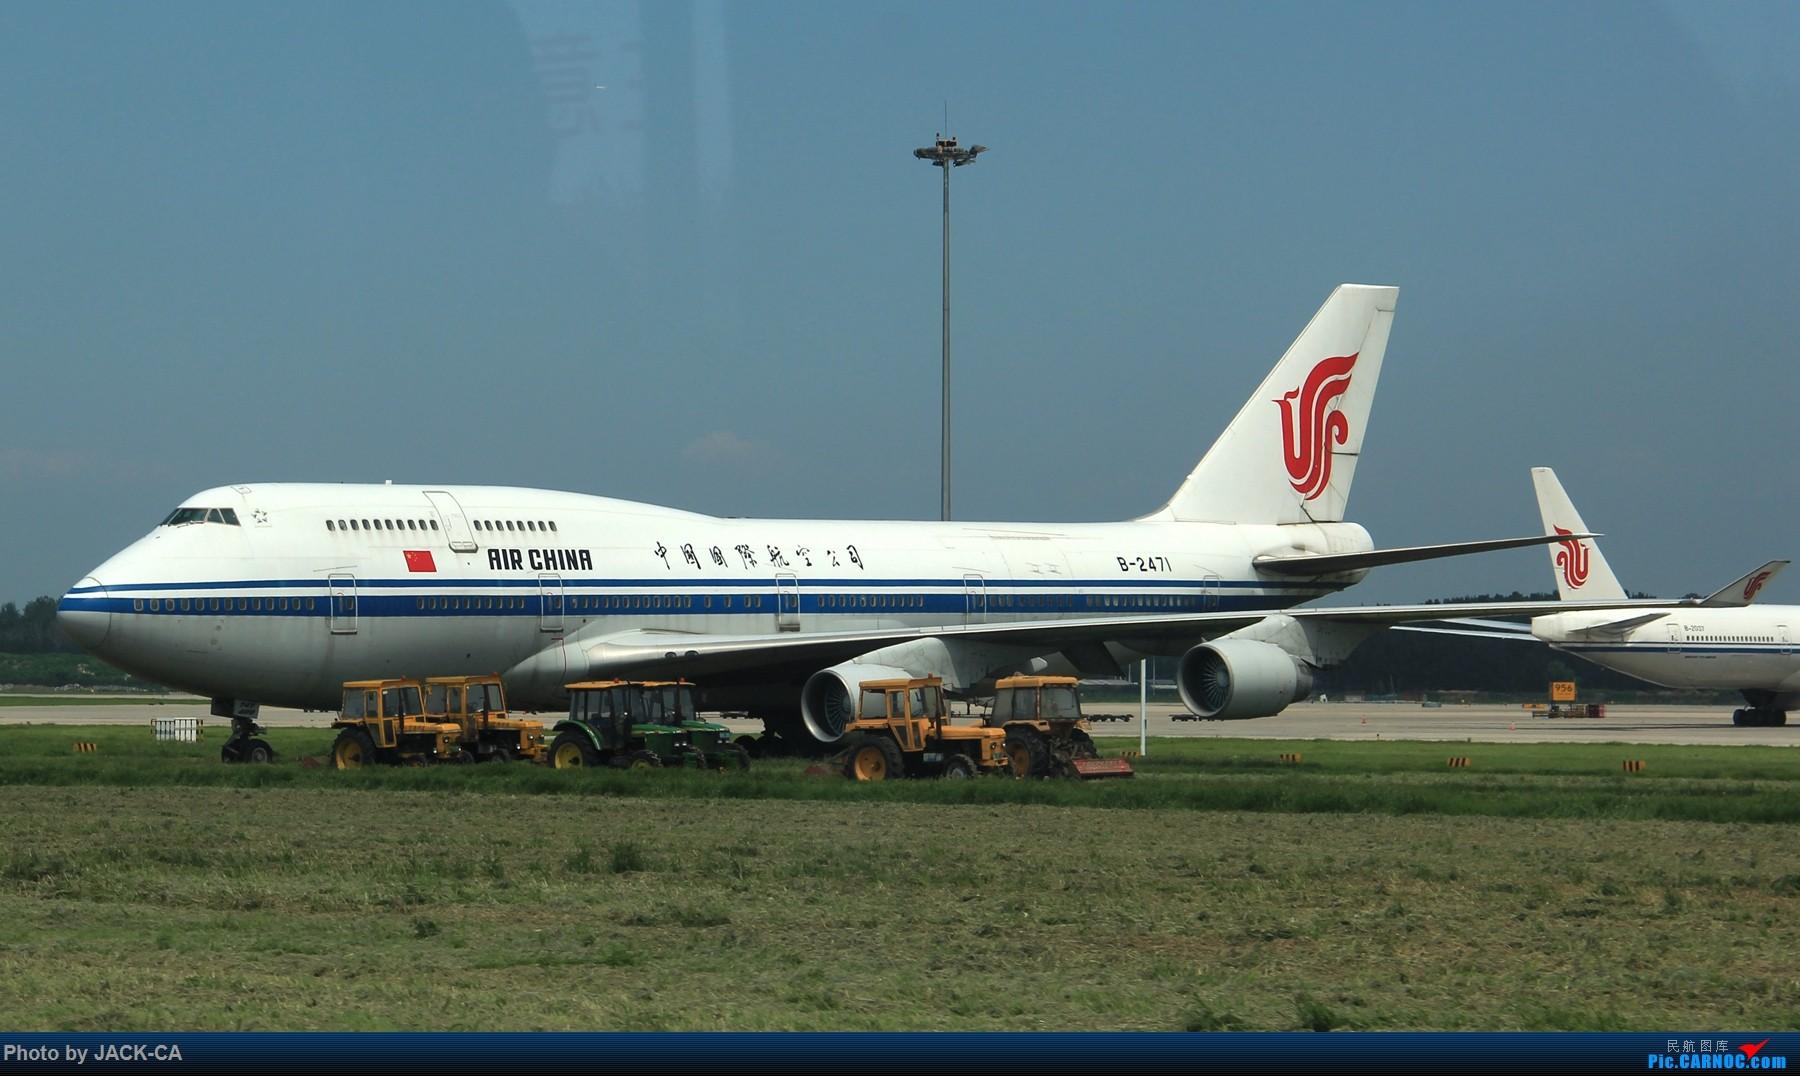 Re:Re:Re:[原创]**两图党**雾霾前的一拍,荷航新装+延误的俄航 BOEING 747-400